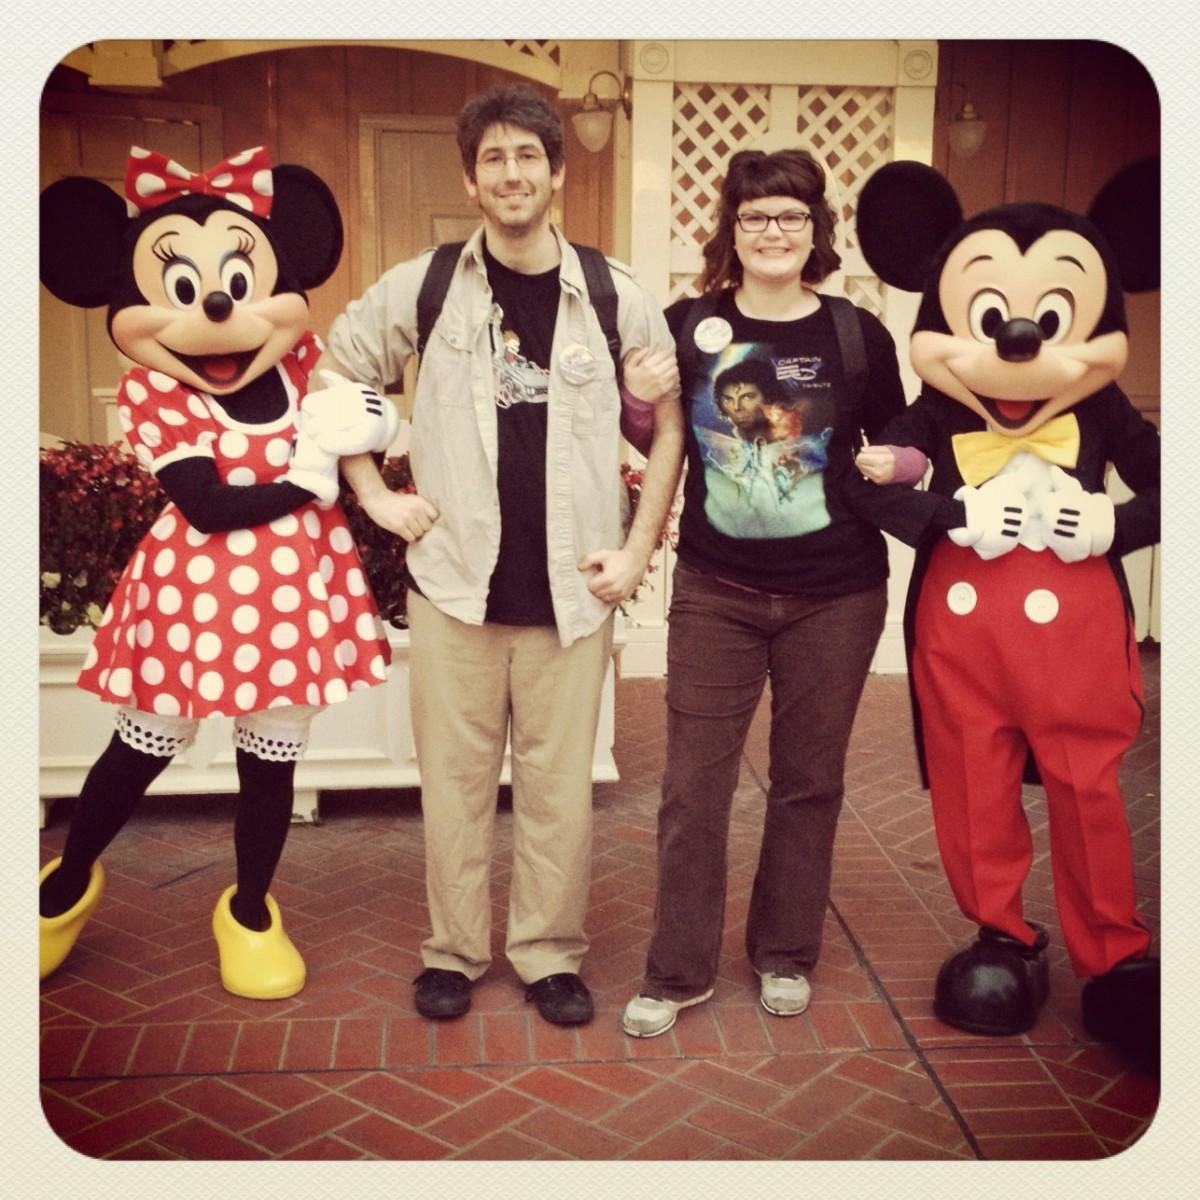 A Disneyland (or Disney World) Honeymoon: Perks for Bride & Groom